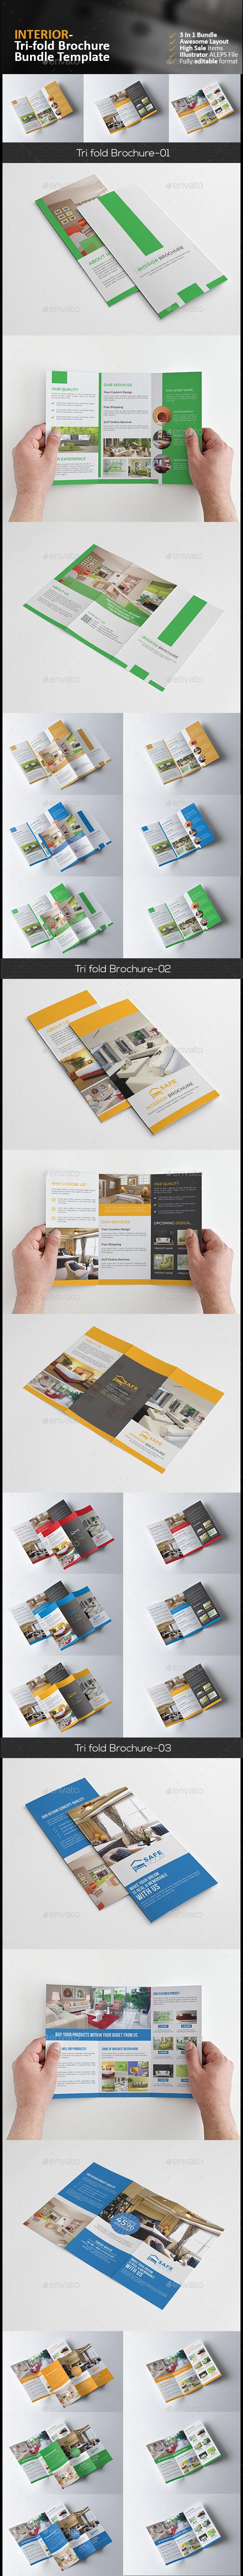 Interior Tri Fold Brochure Bundle 3 in 1 - Corporate Brochures